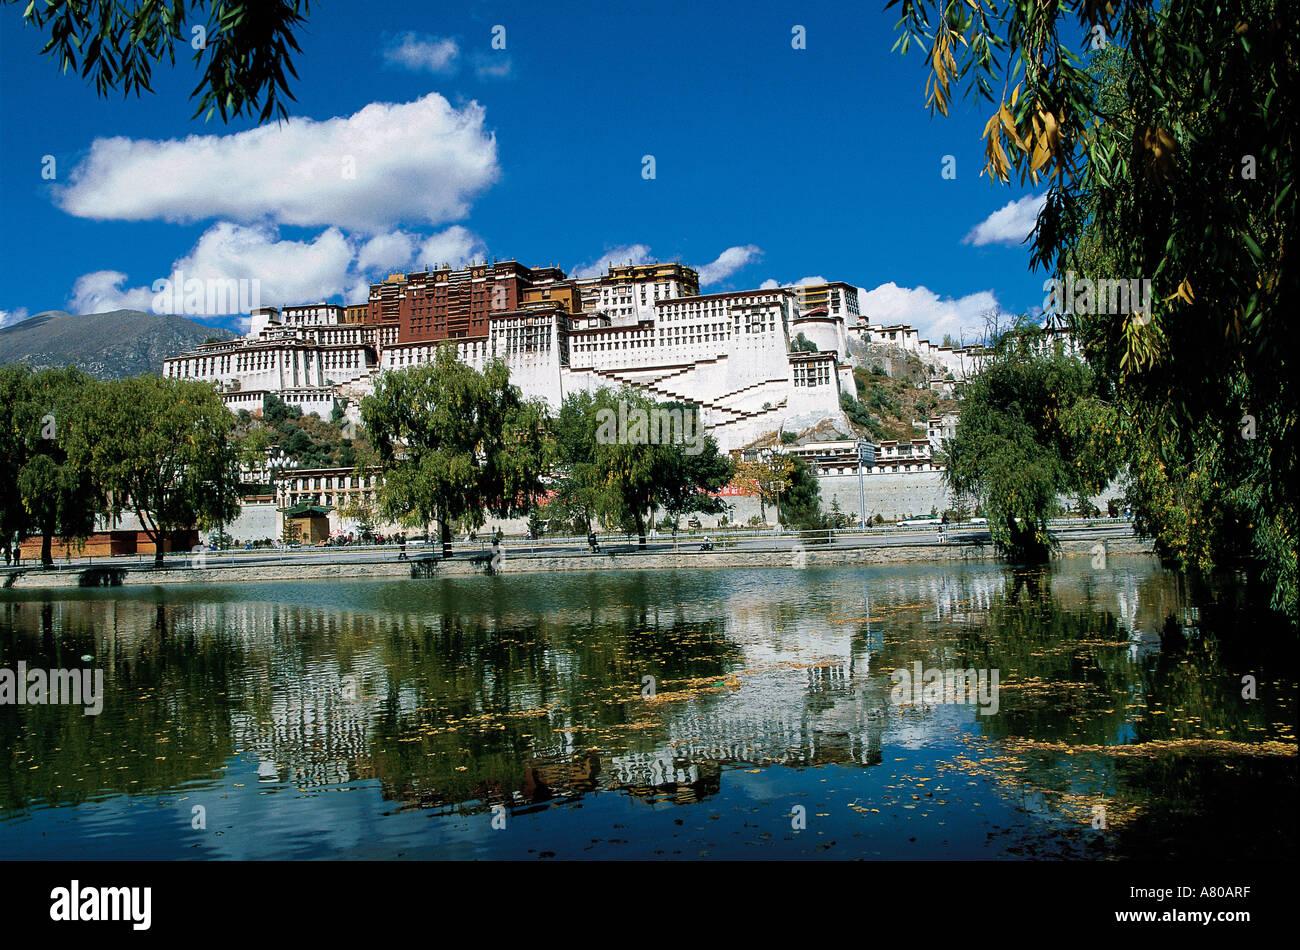 China, Tibet, Lhassa, Potala Palace, old house of Dalai Lamas - Stock Image